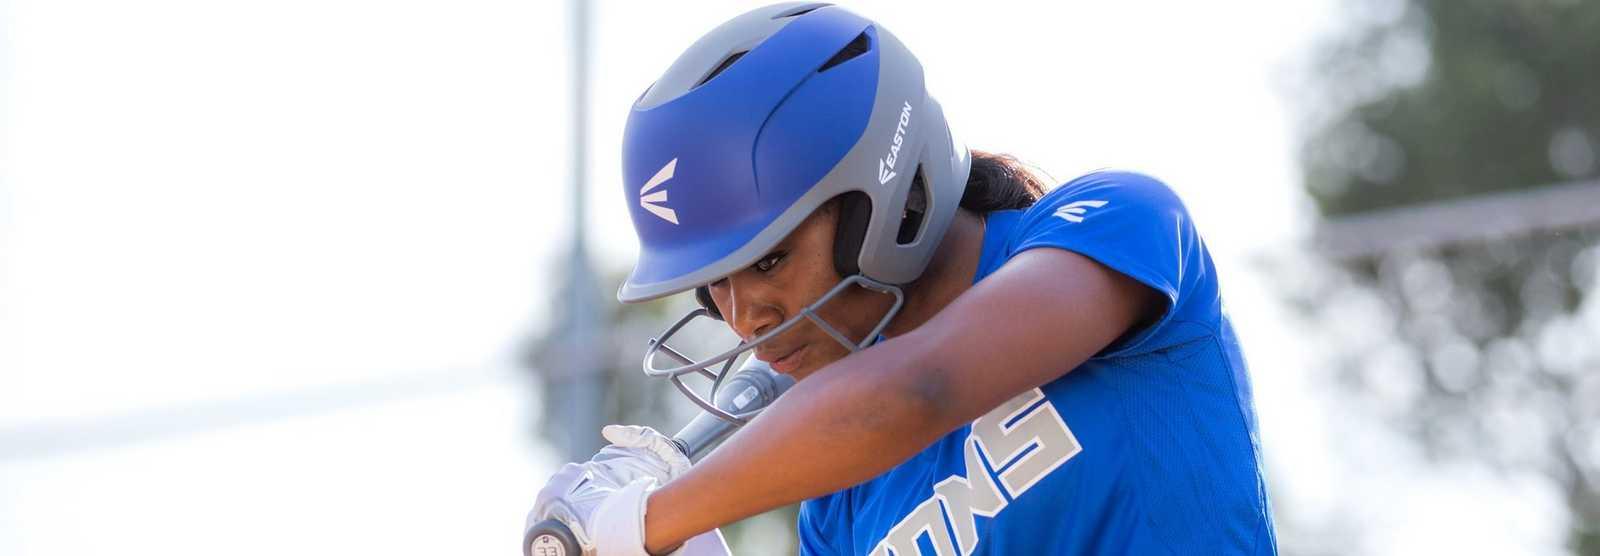 2018-fastpitch-softball-batting-helmets